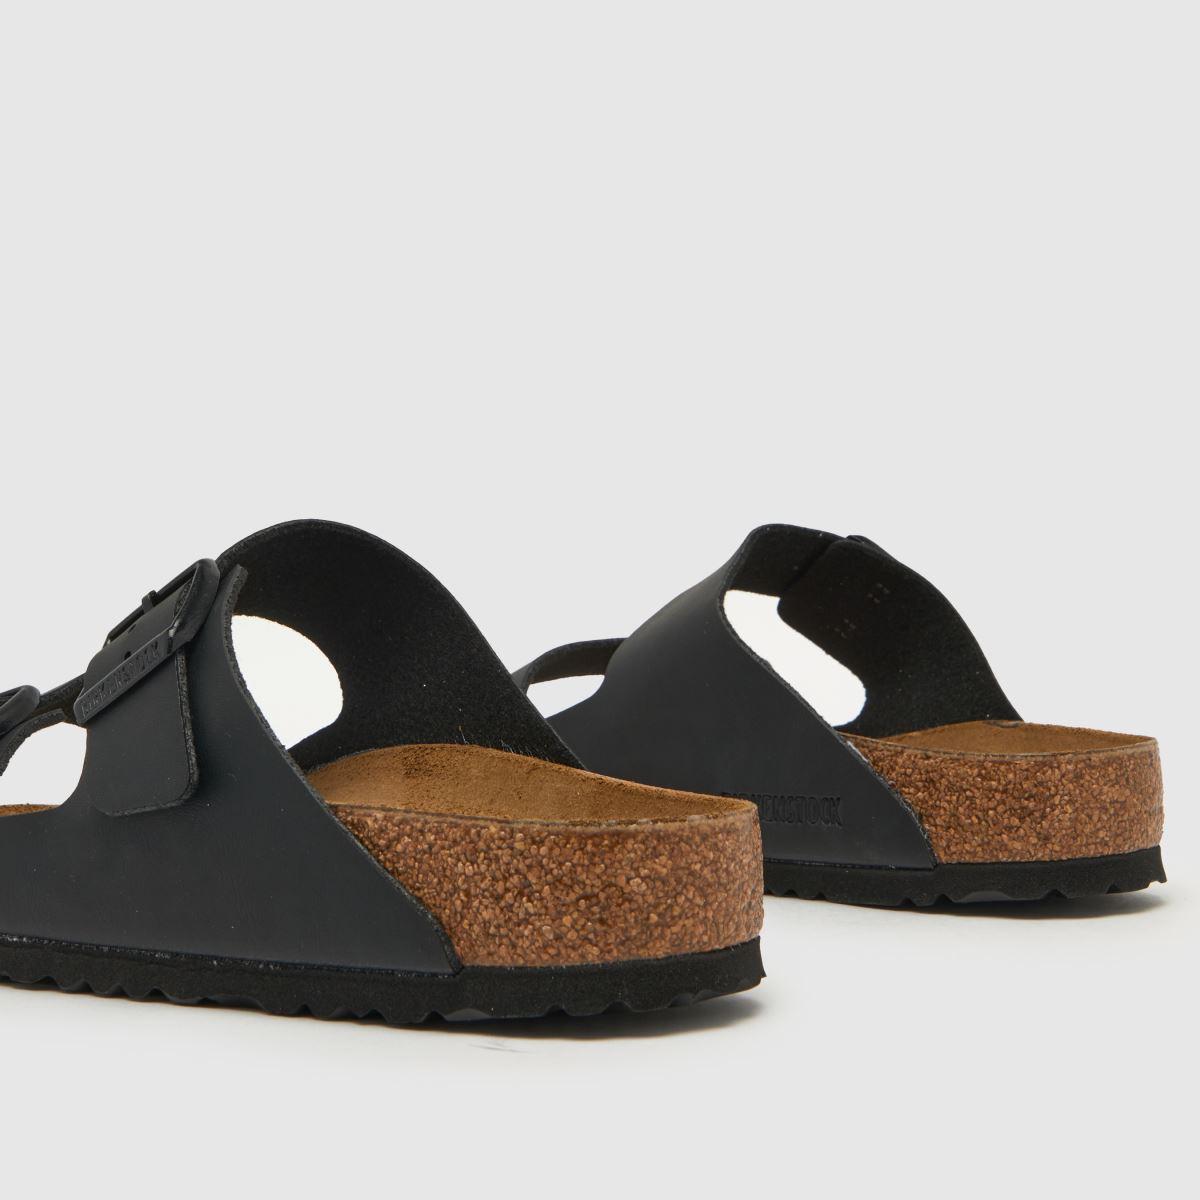 Damen schuh Schwarz birkenstock Arizona Sandalen | schuh Damen Gute Qualität beliebte Schuhe 4d0b6a